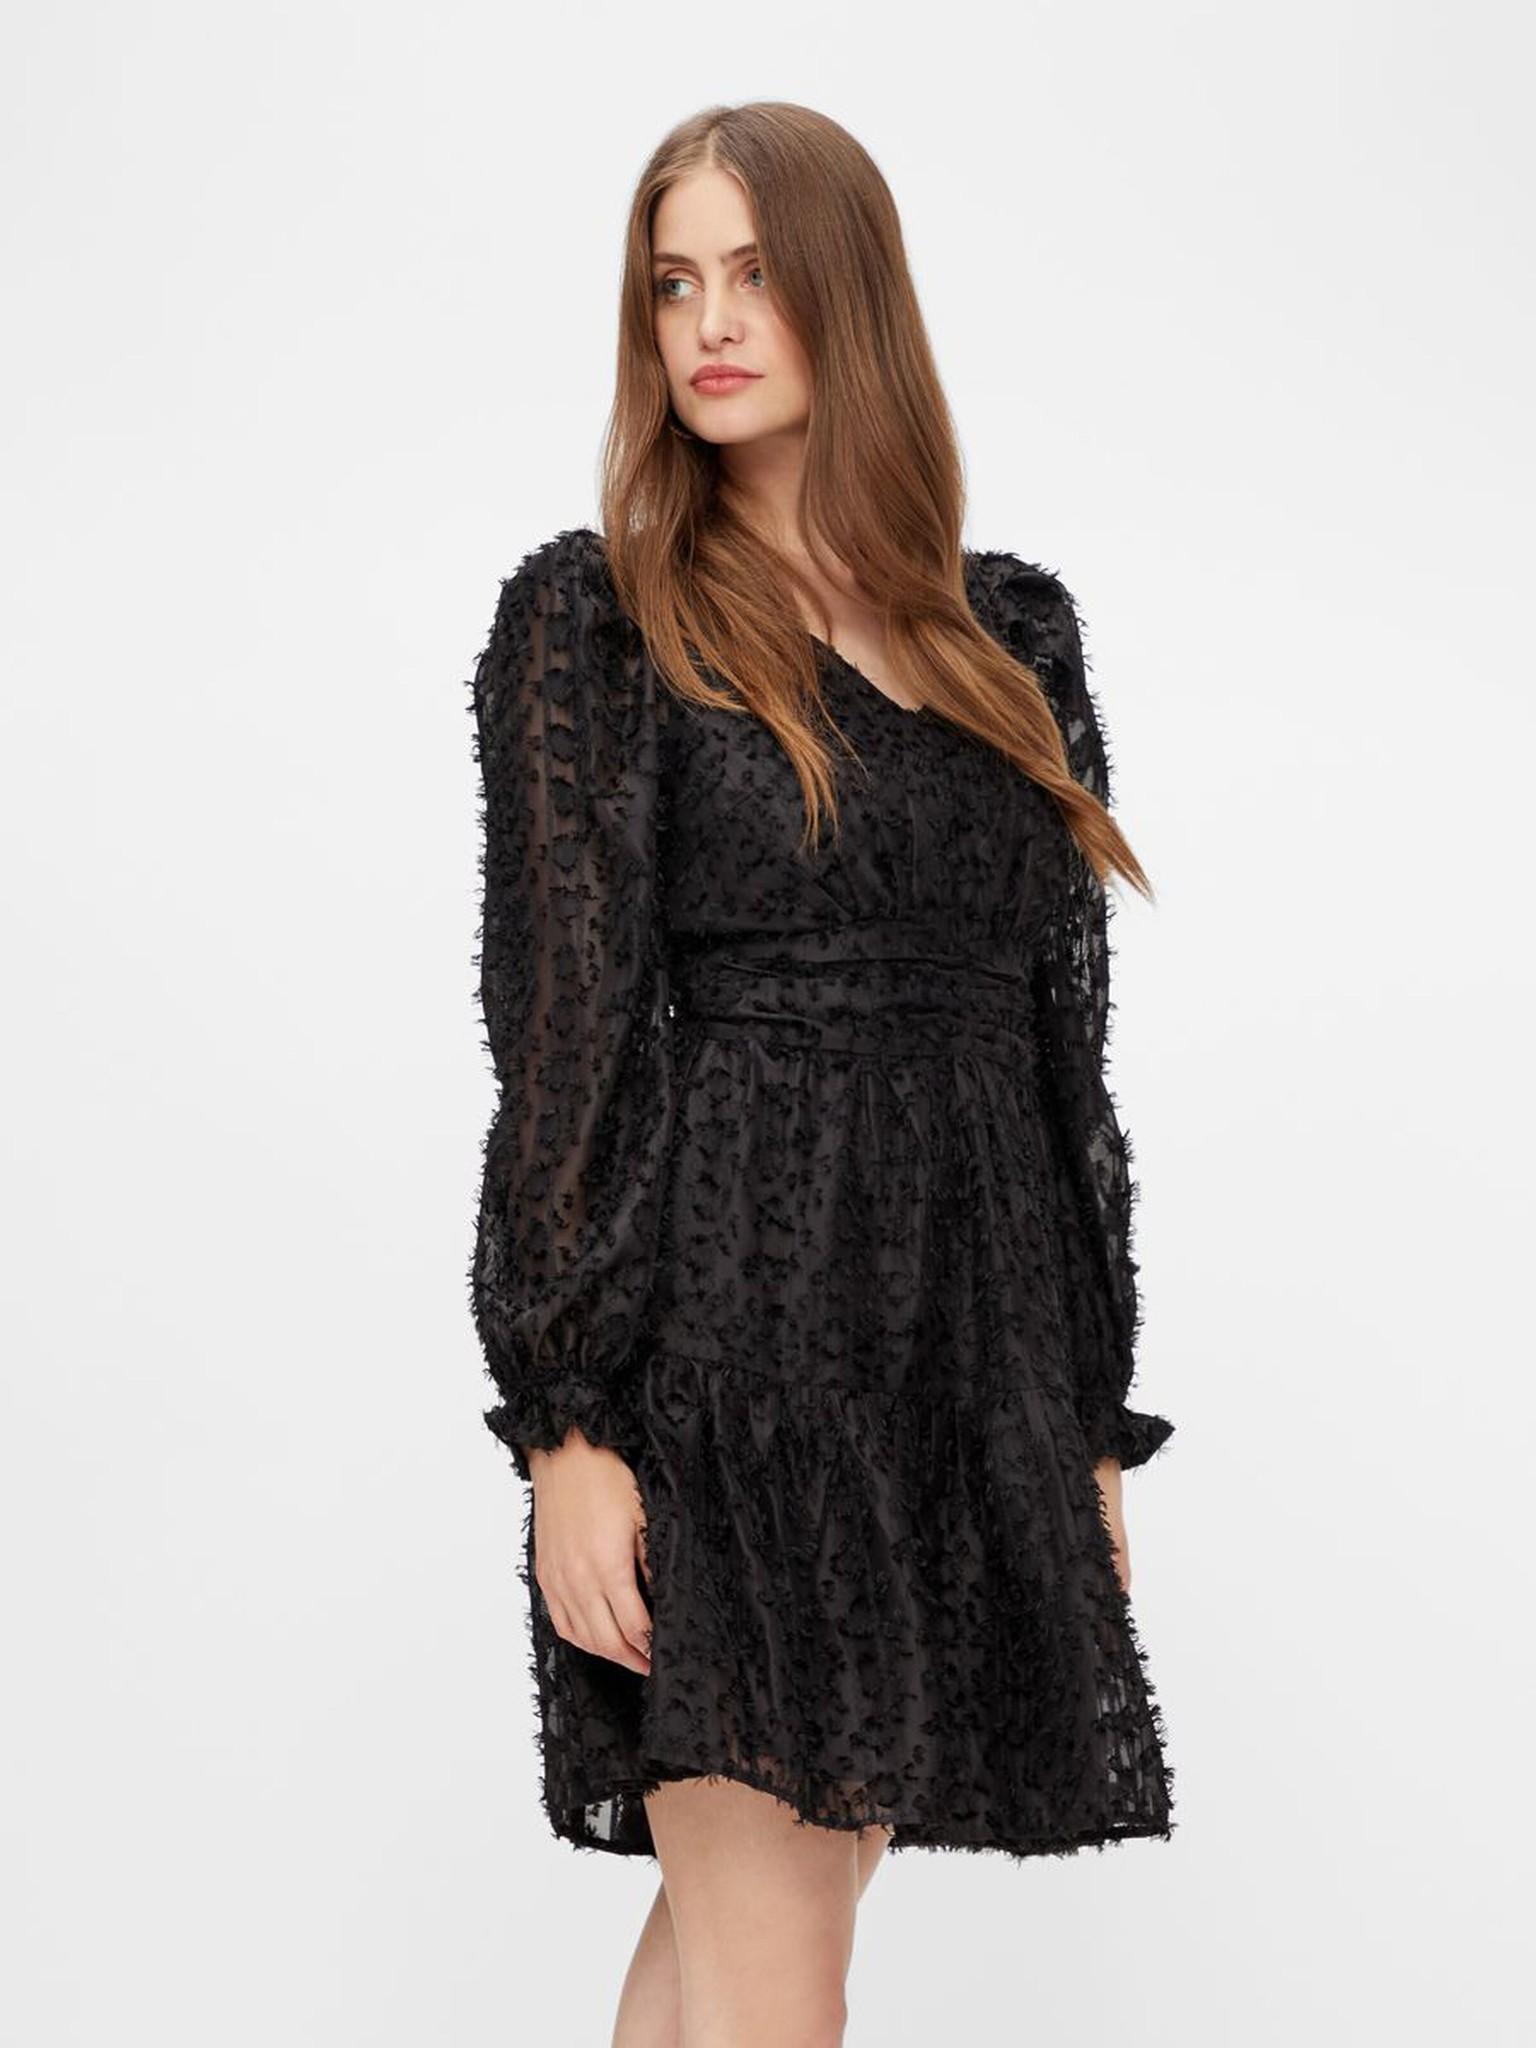 Jurk Vivian dress black-4